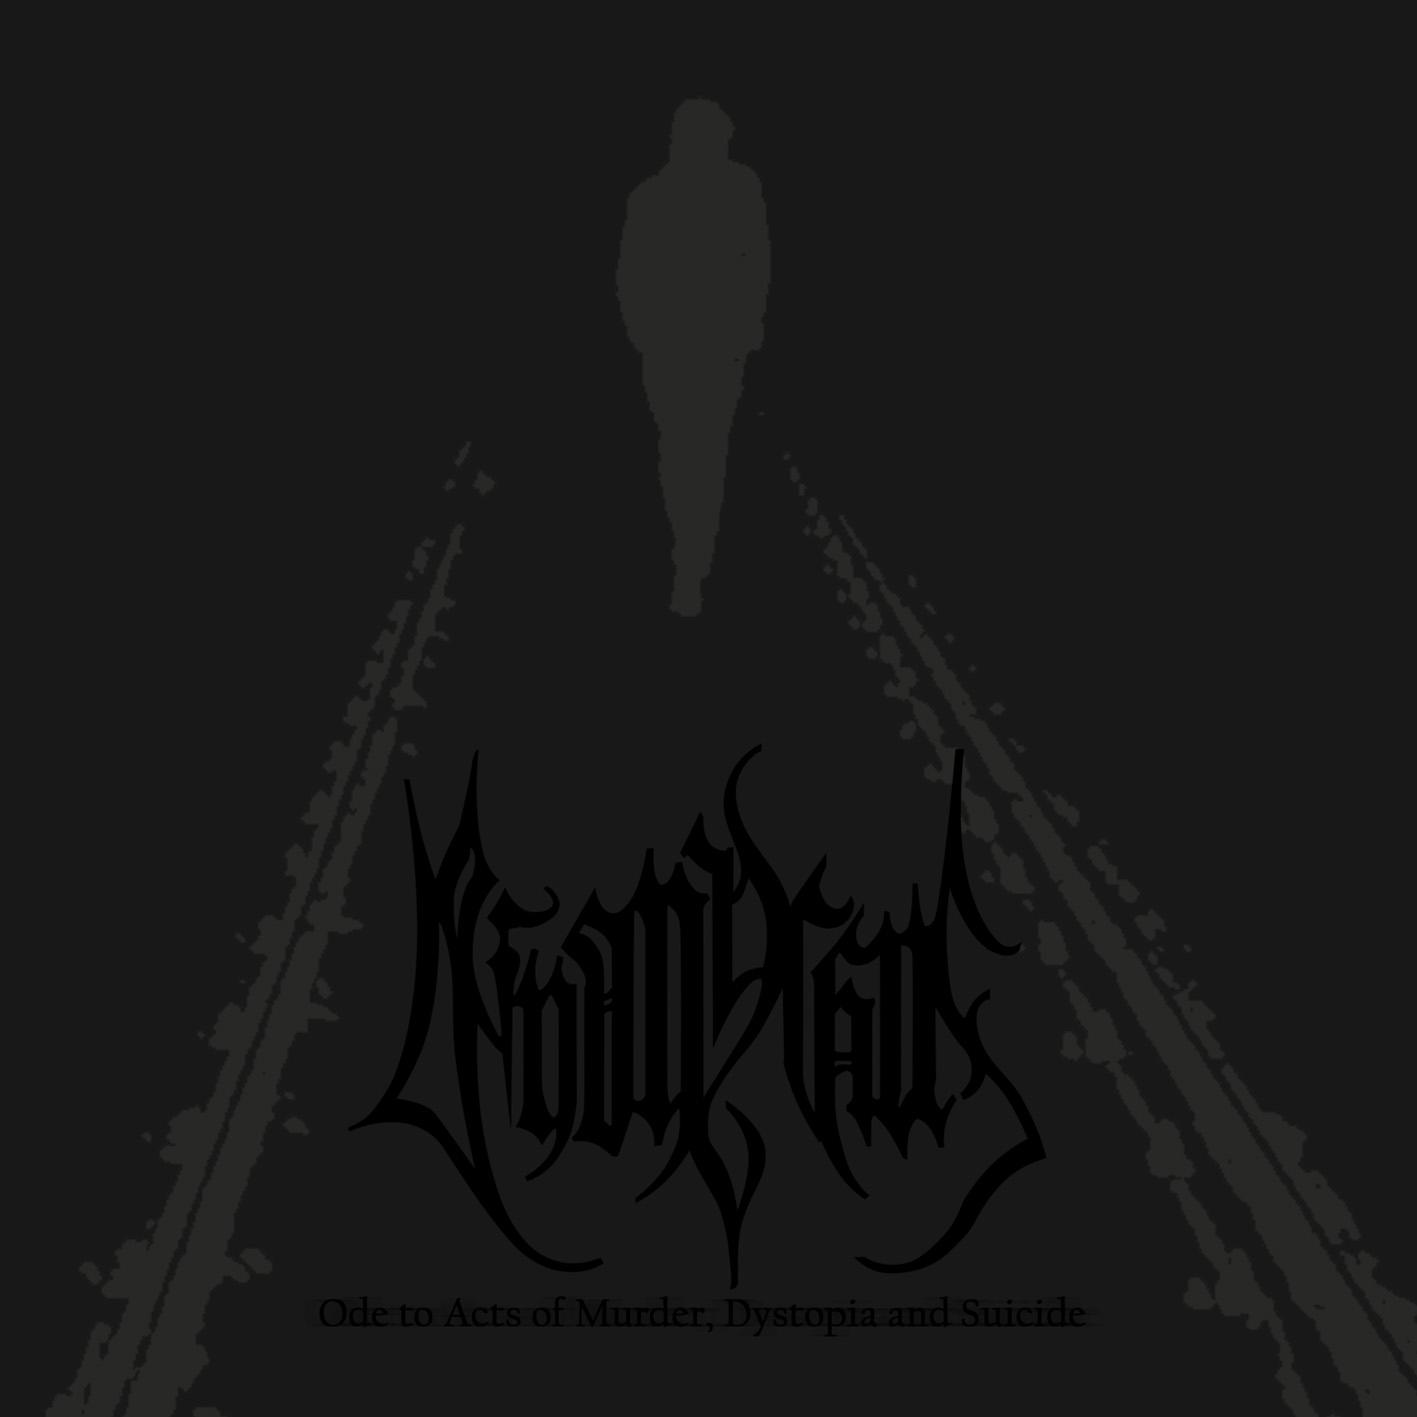 Deinonychus - Ode - cover